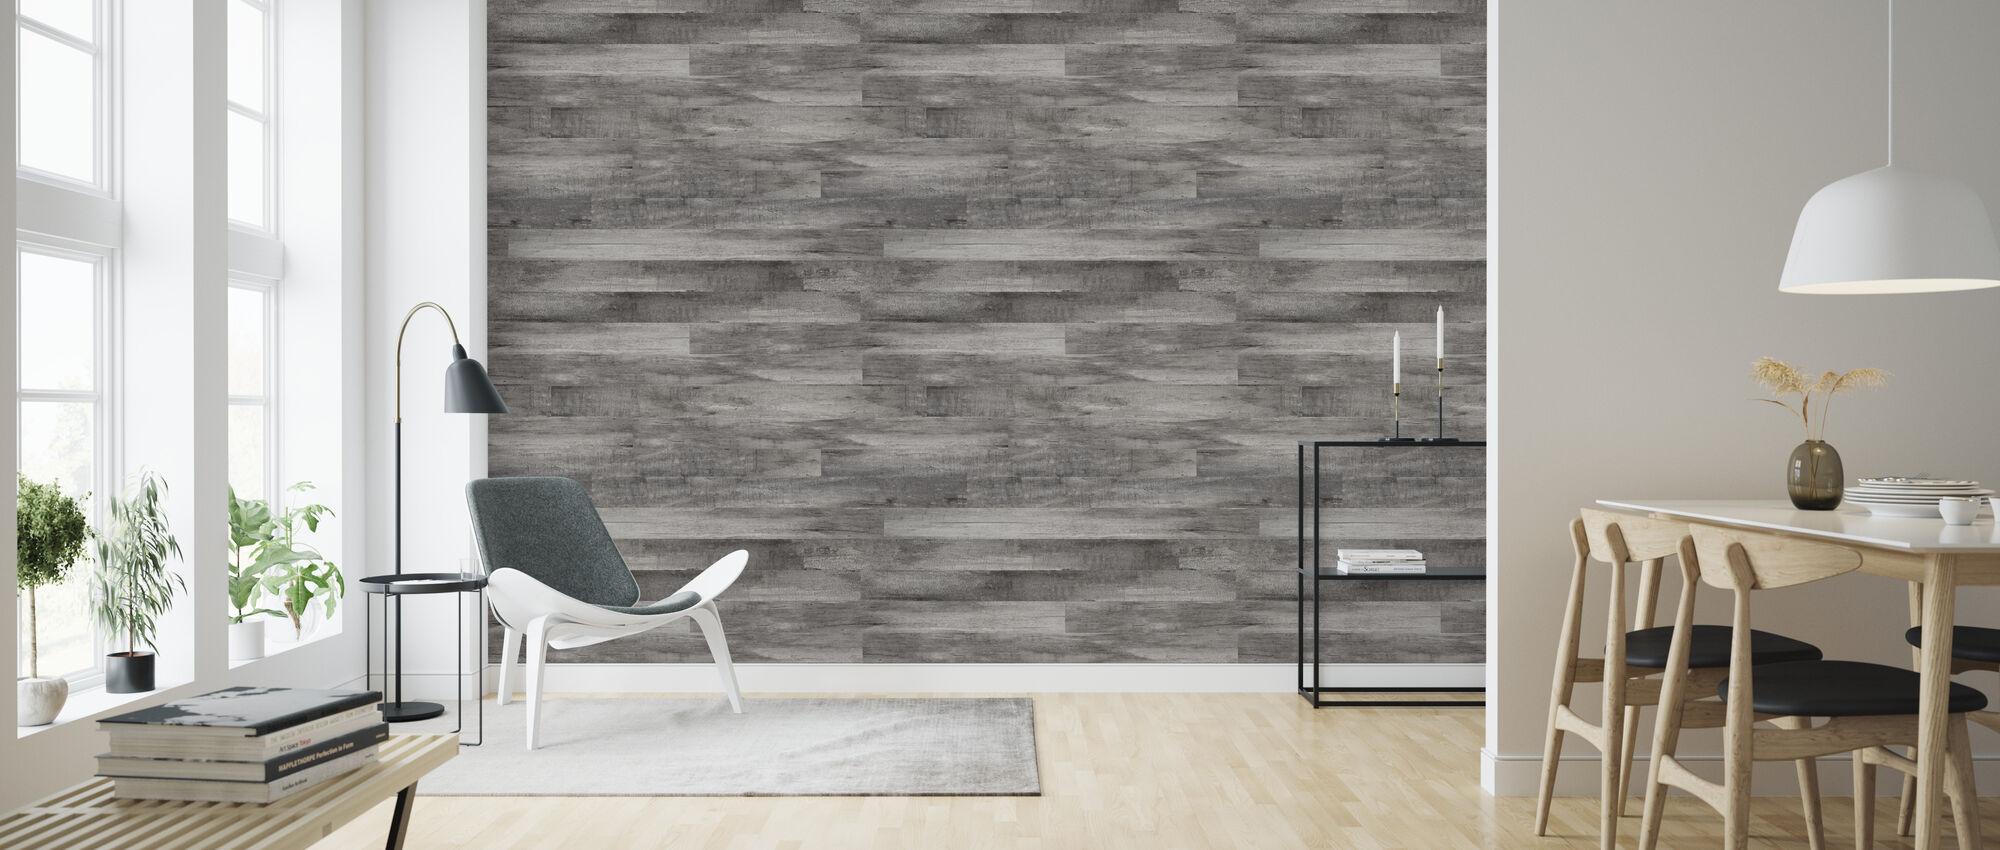 Gray Rustic Wood - Wallpaper - Living Room